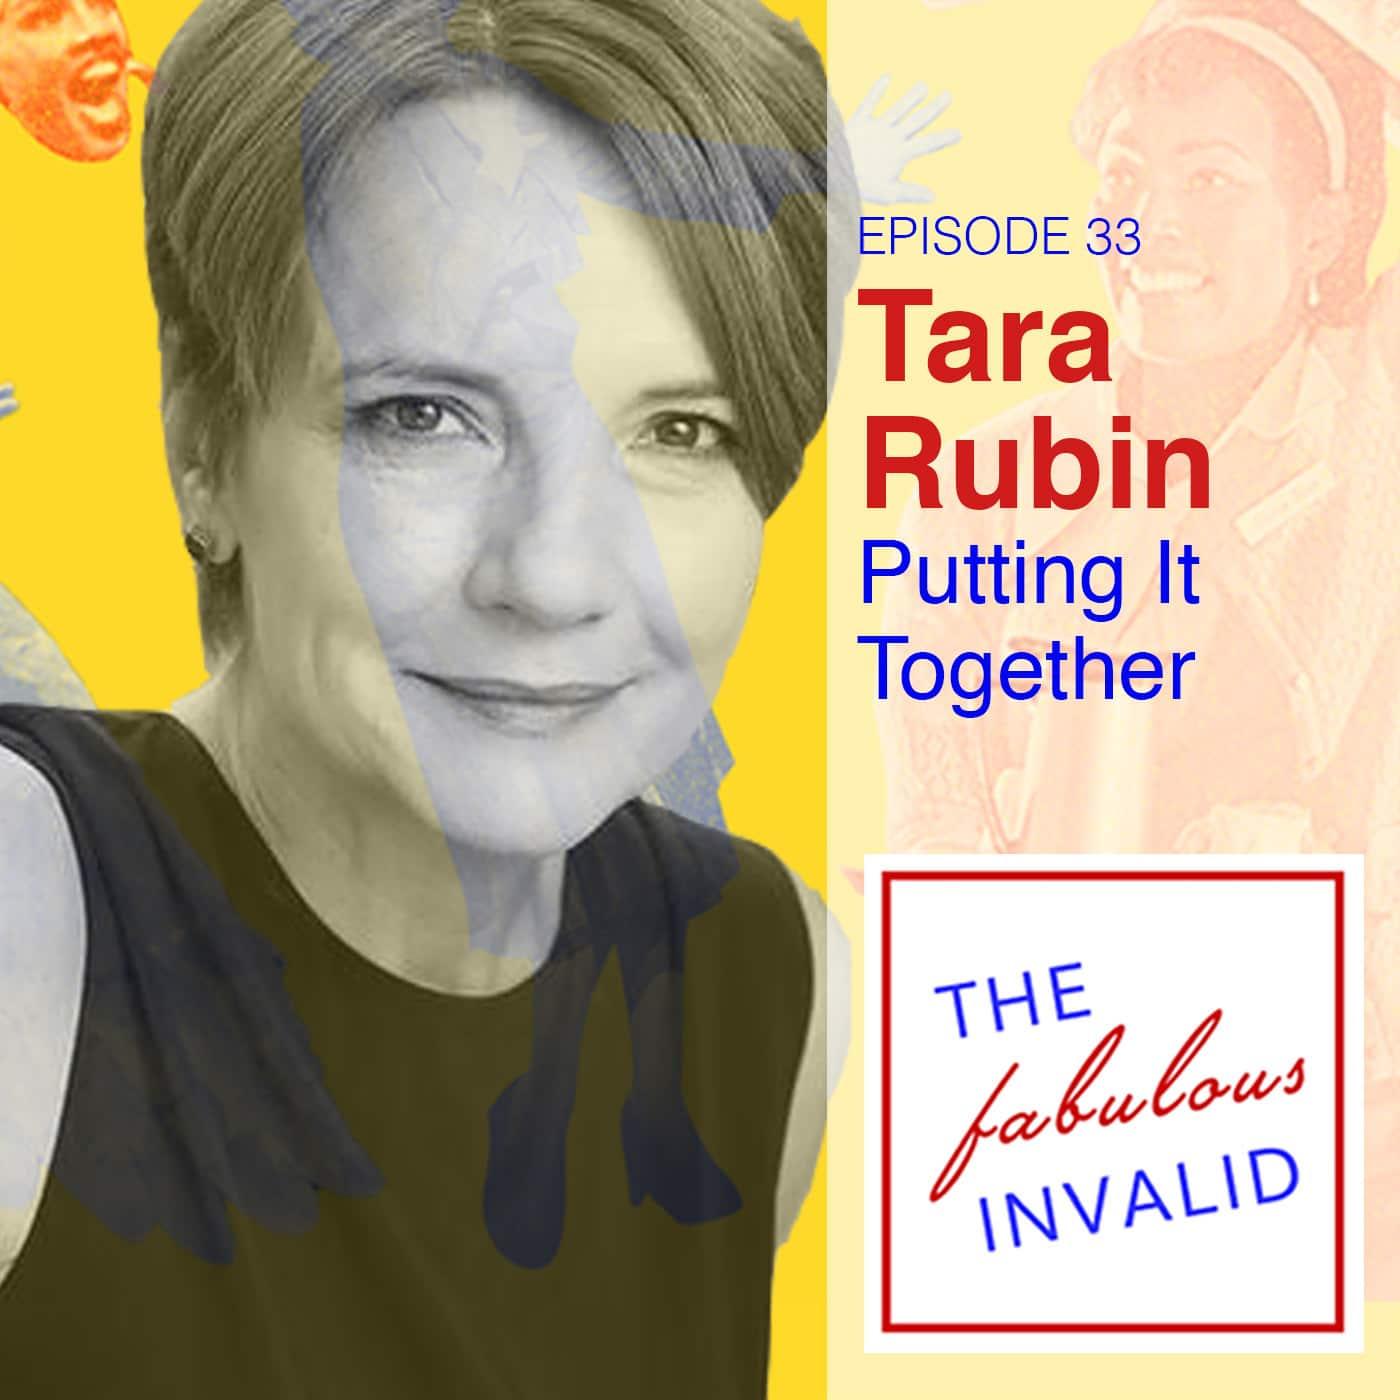 The Fabulous Invalid Ep 33 Tara Rubin